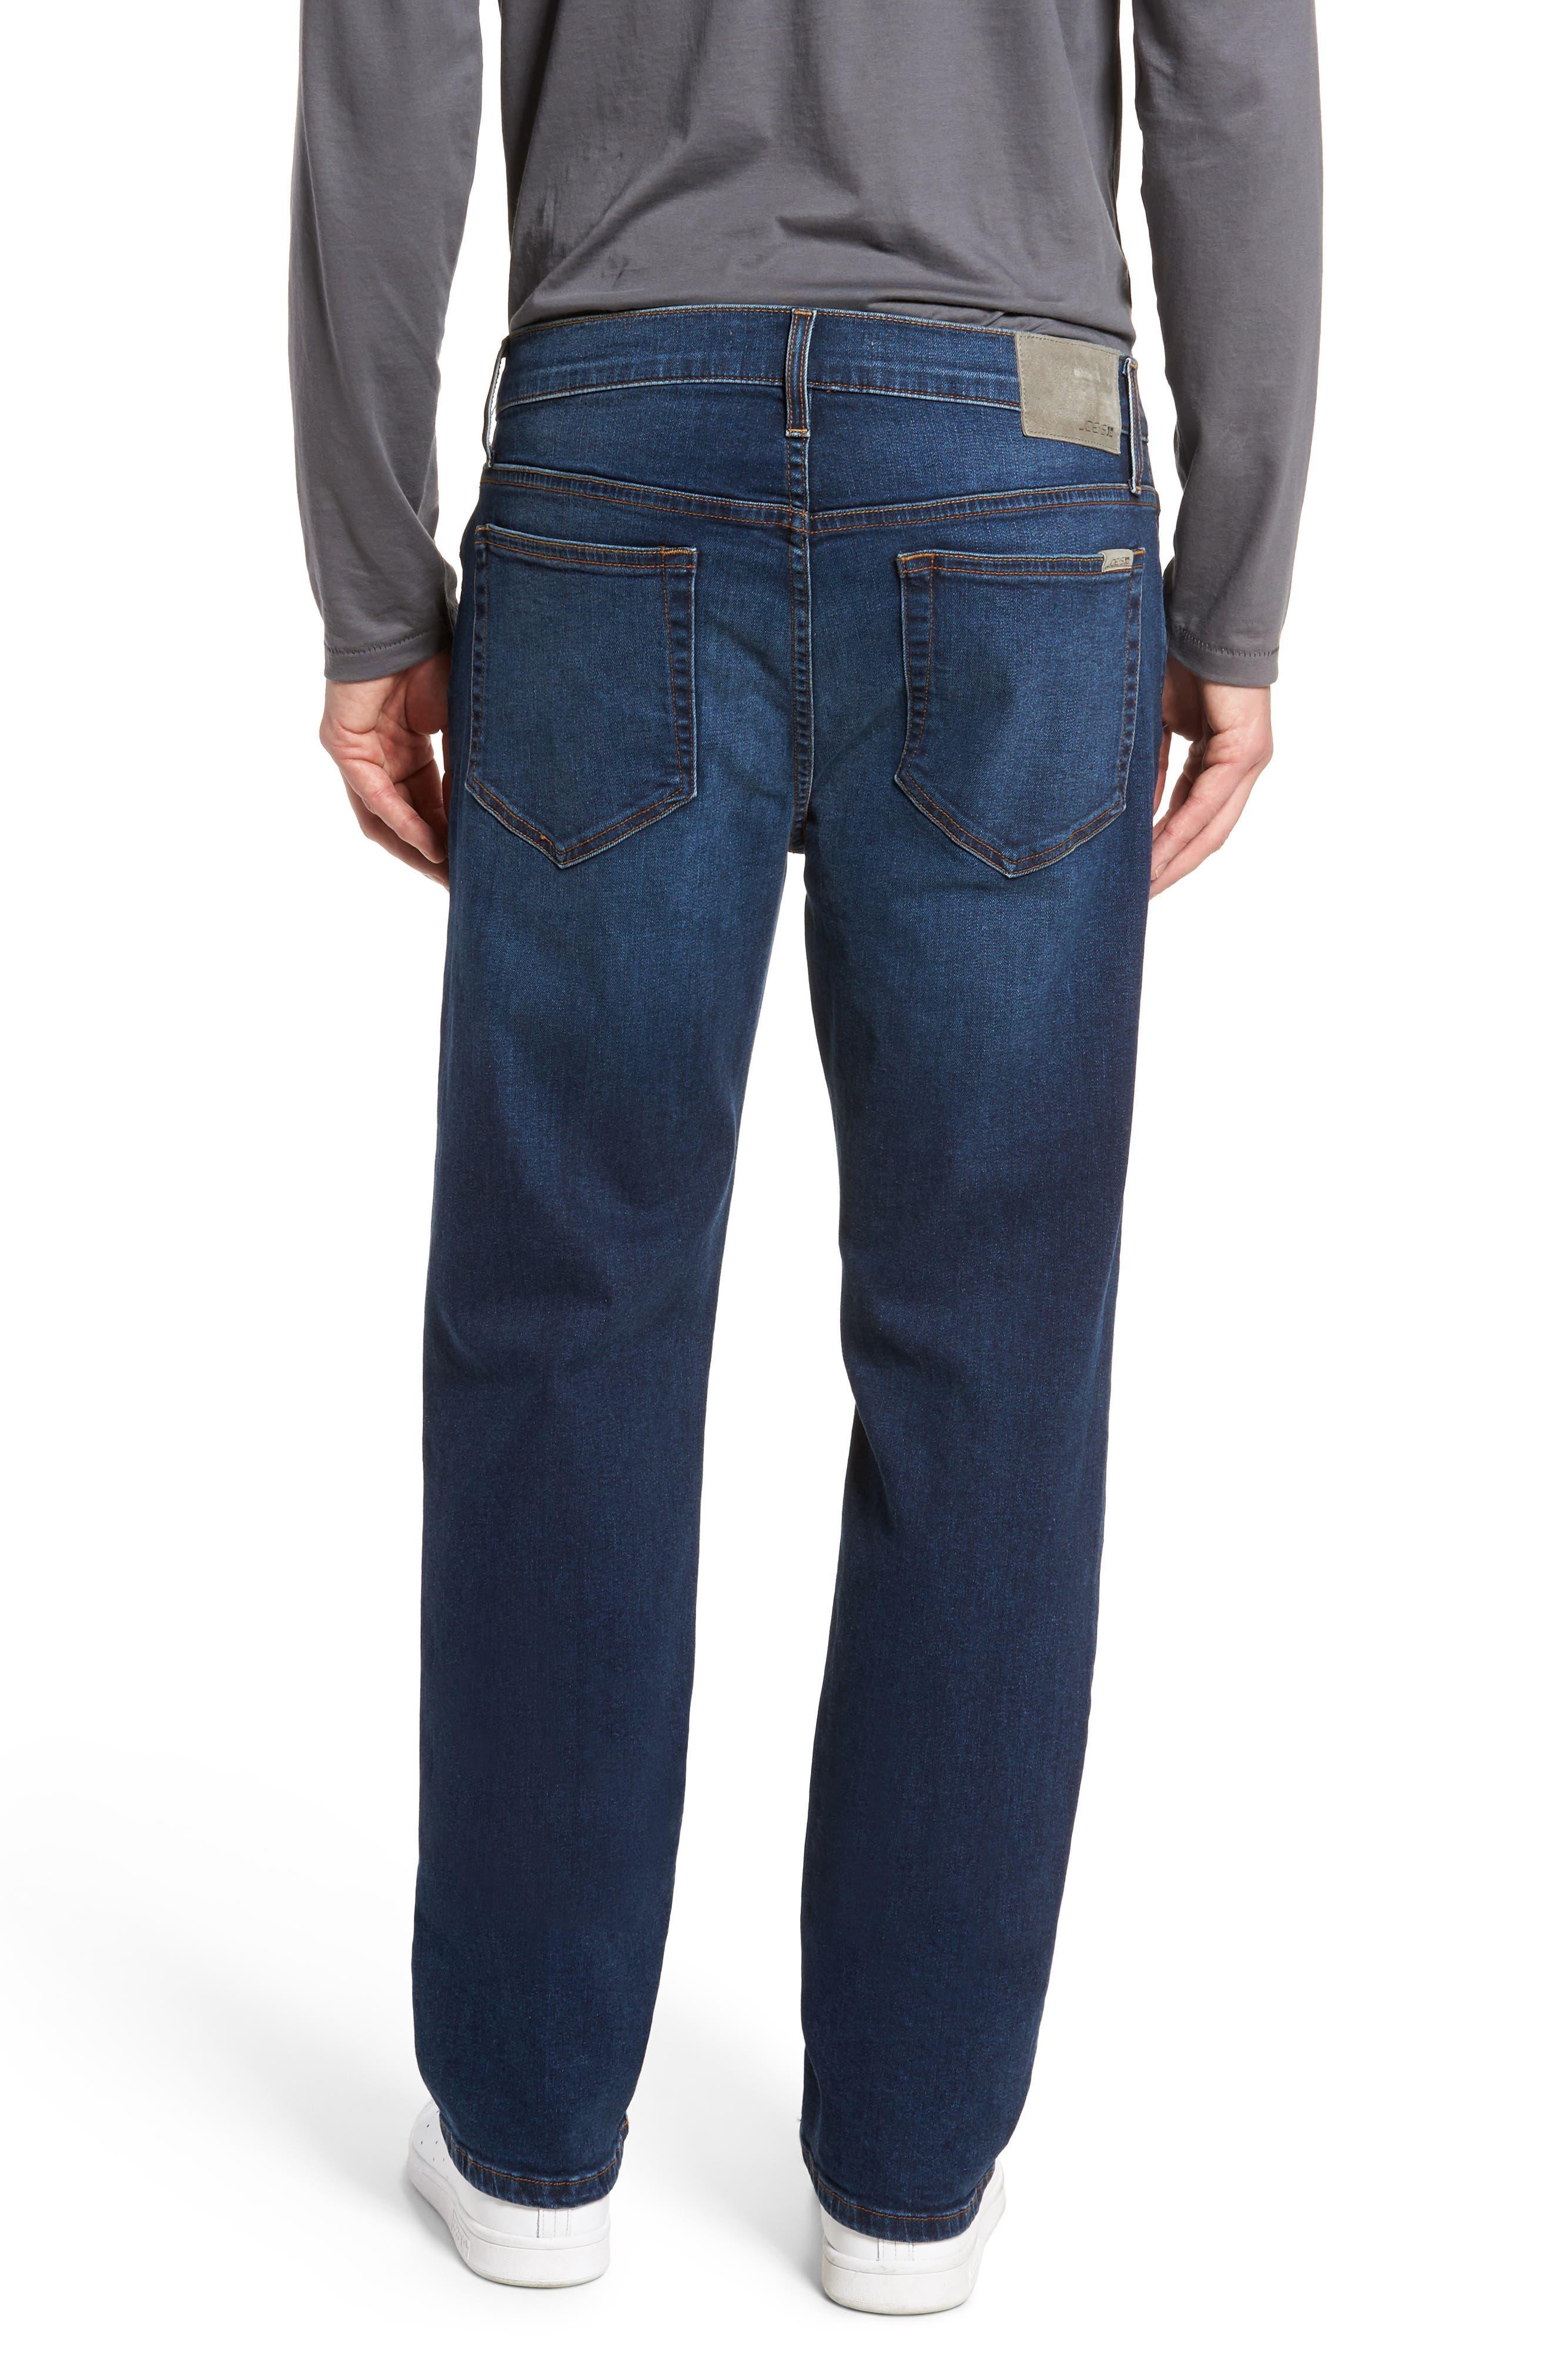 Brixton Slim Straight Leg Jeans,                             Alternate thumbnail 2, color,